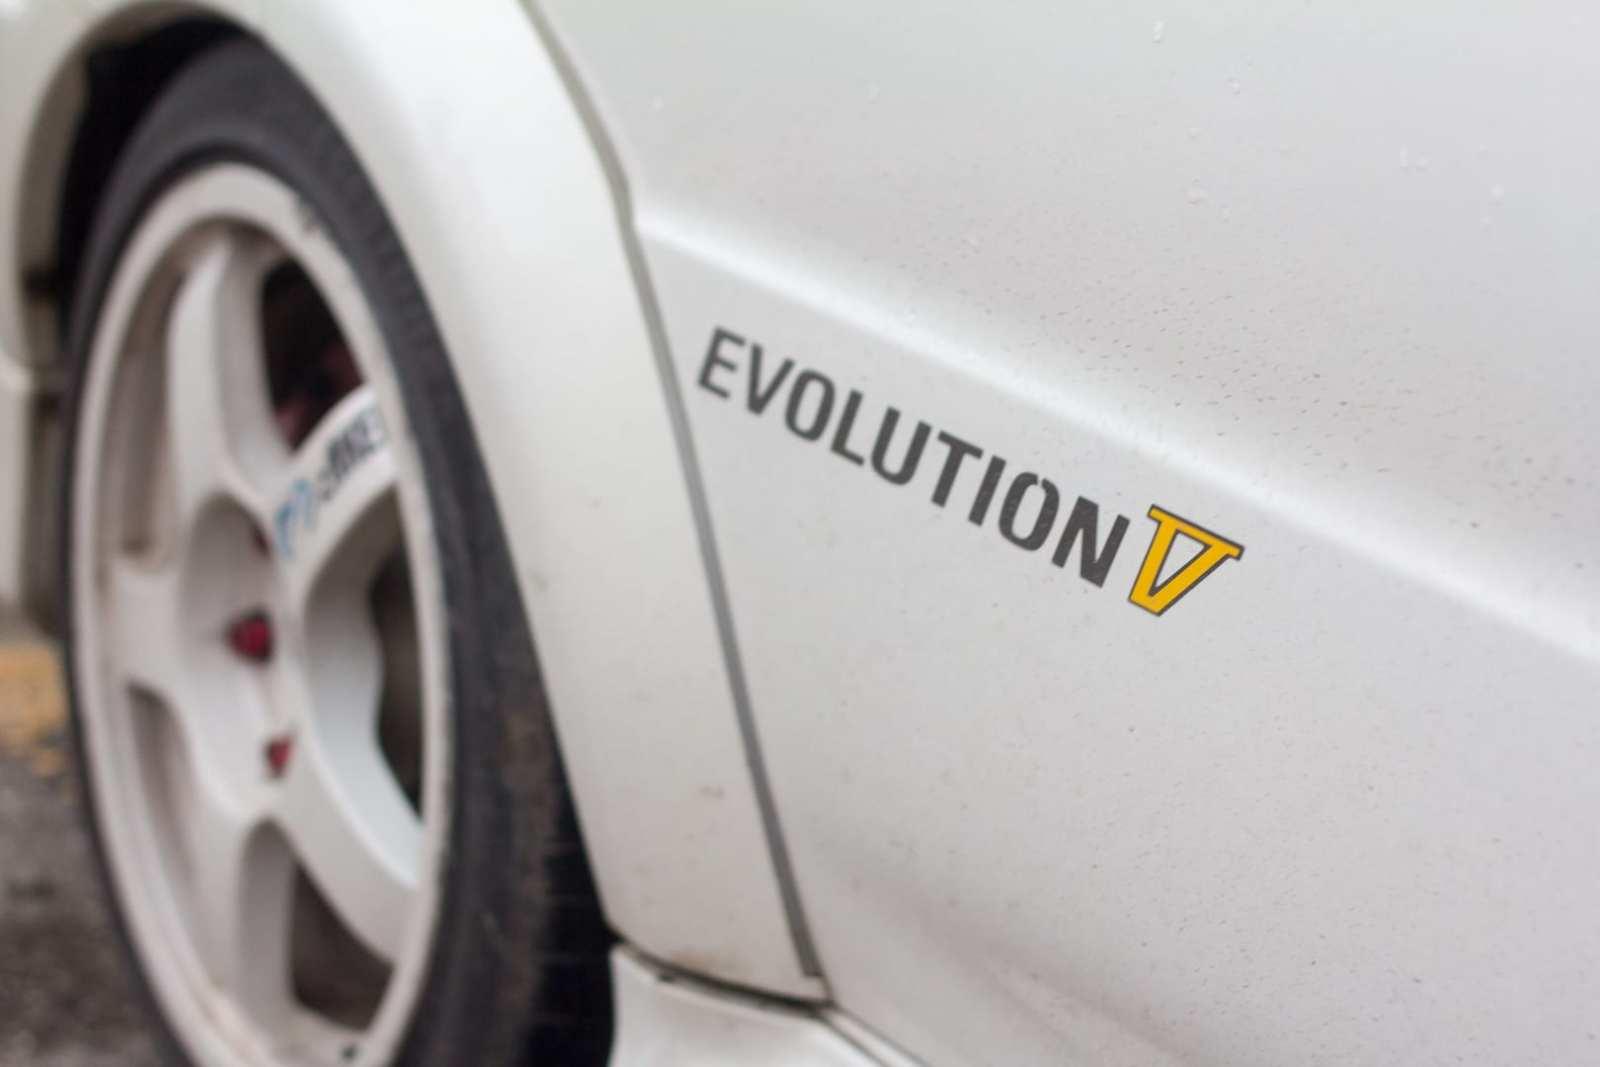 JDM Mitsubishi Lancer EVO V graphics decal